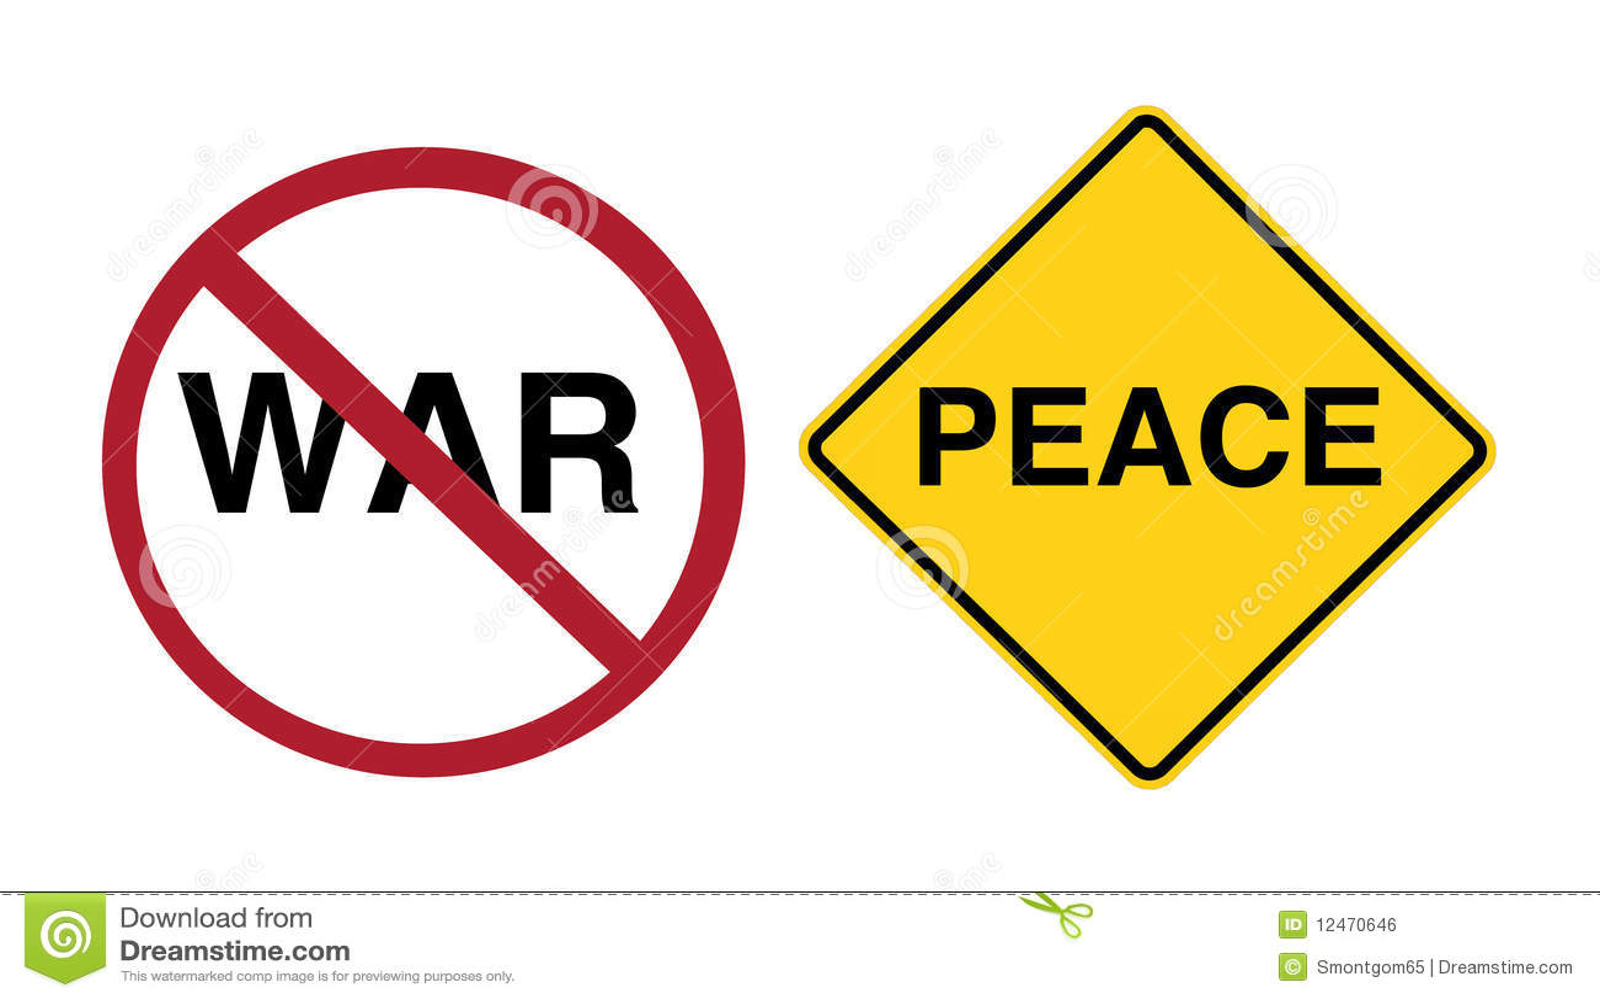 war and peace free pdf